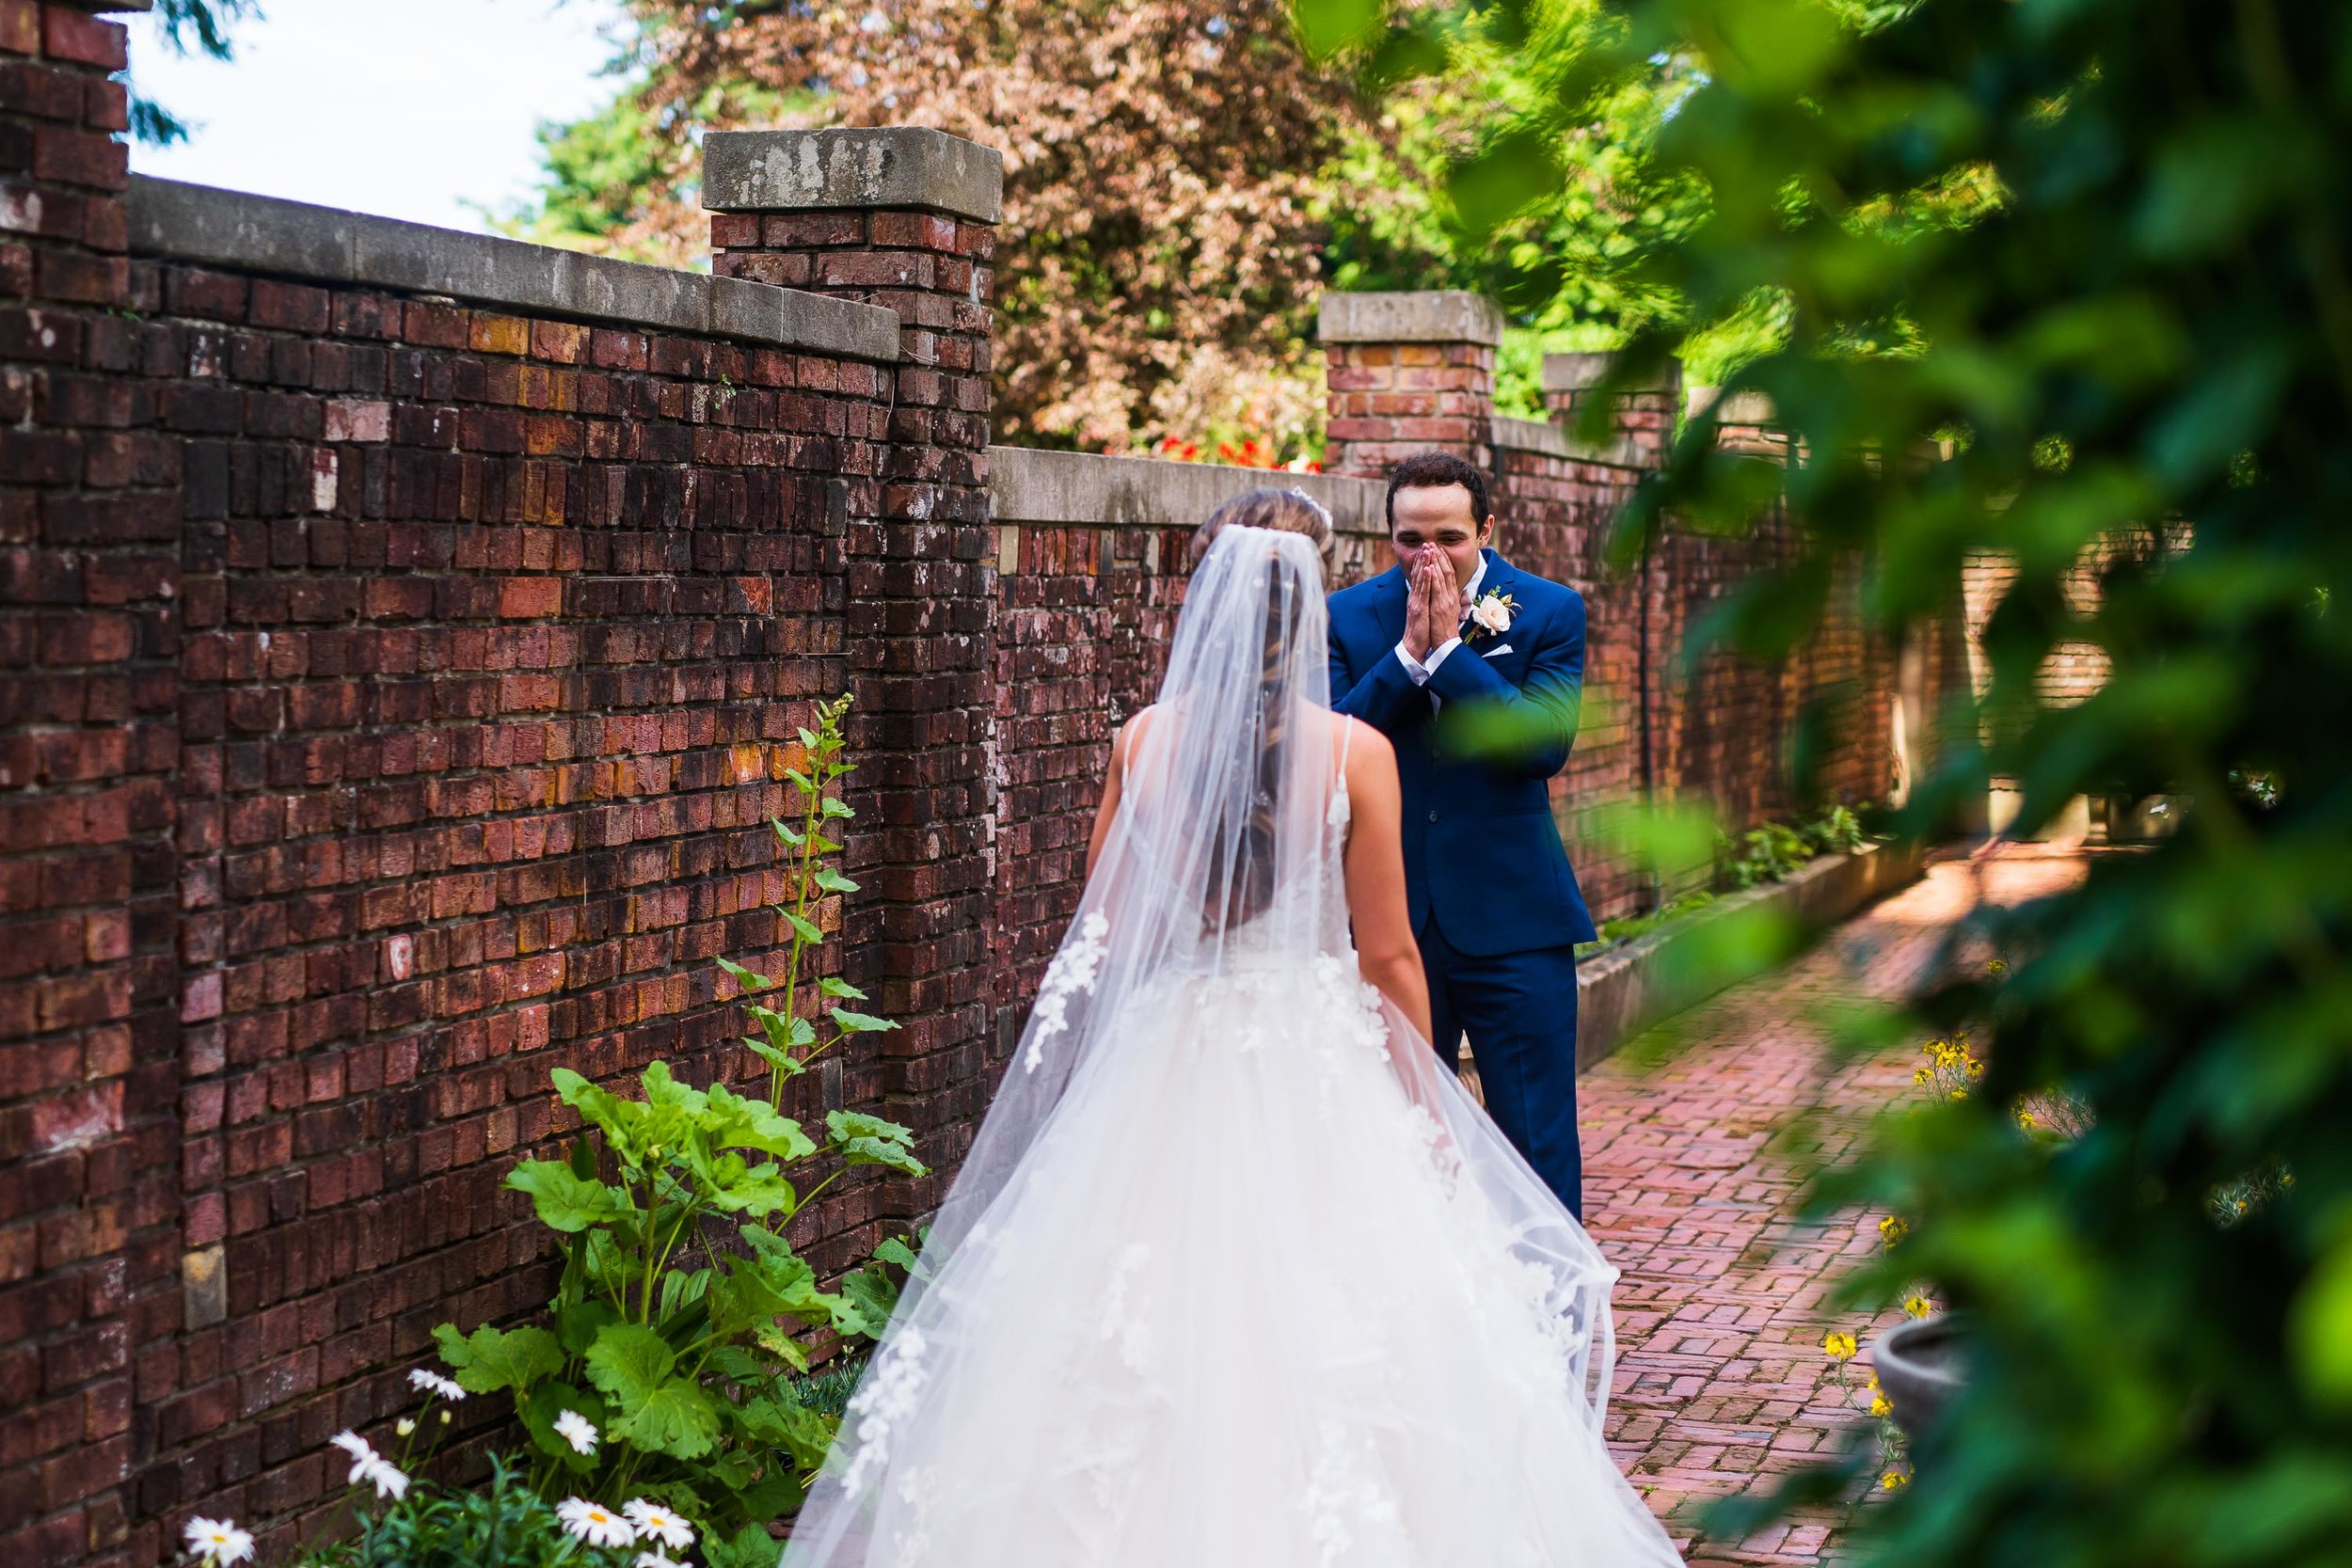 thornewood castle wedding 14.jpg